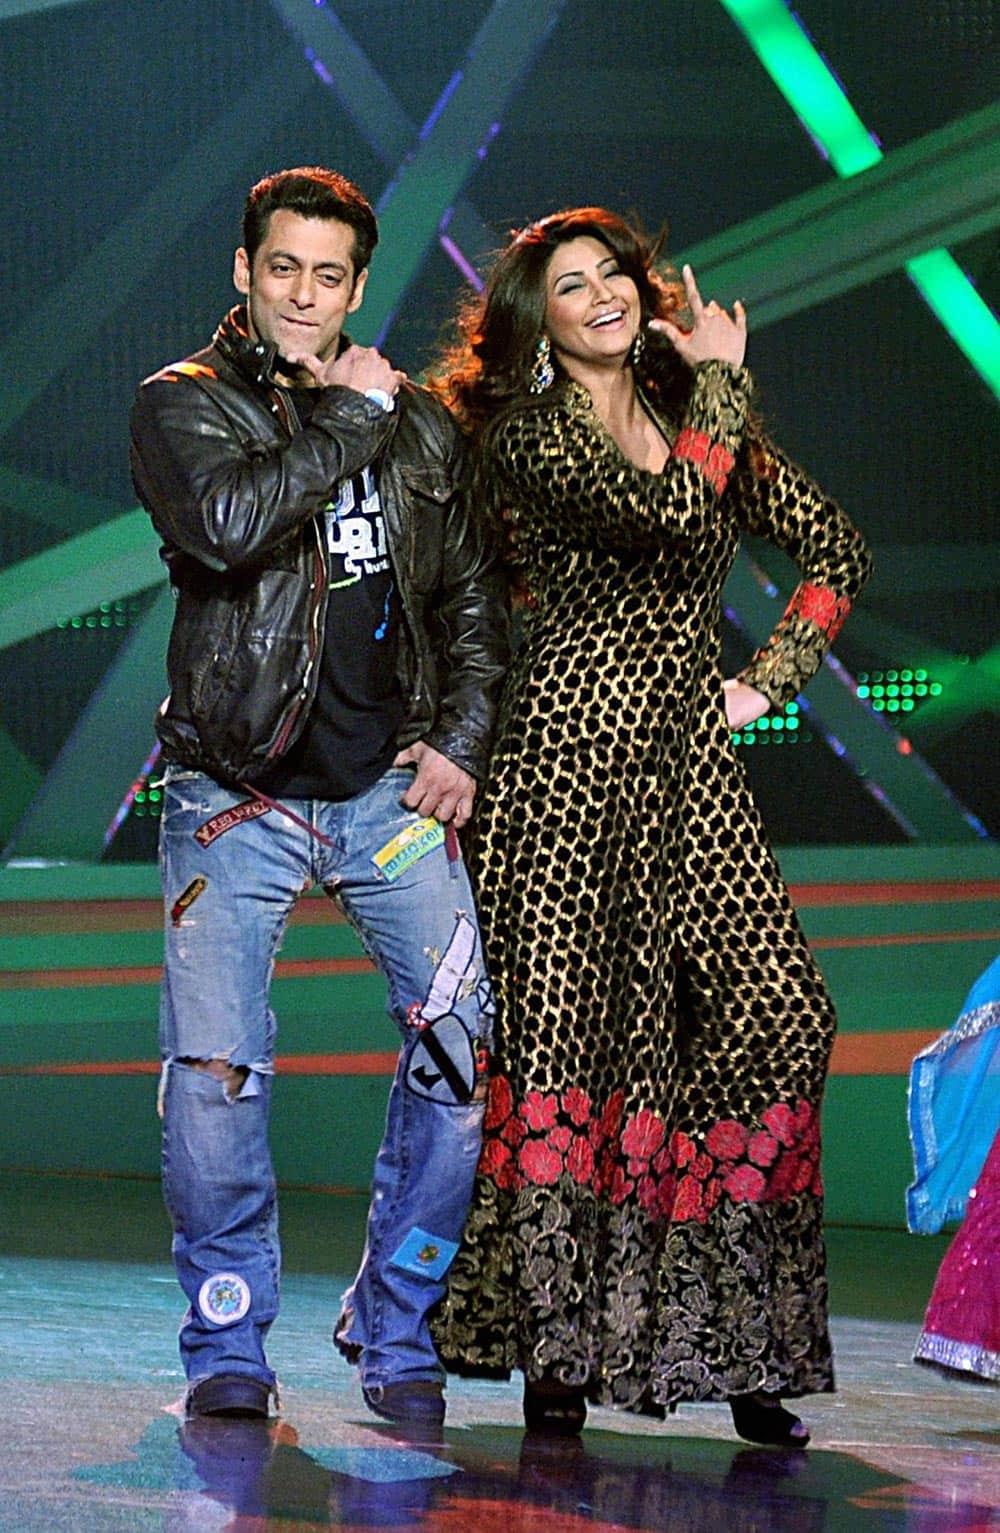 Bollywood actors Salman Khan and Daisy Shah promote their upcoming film 'Jai Ho' in Mumbai.